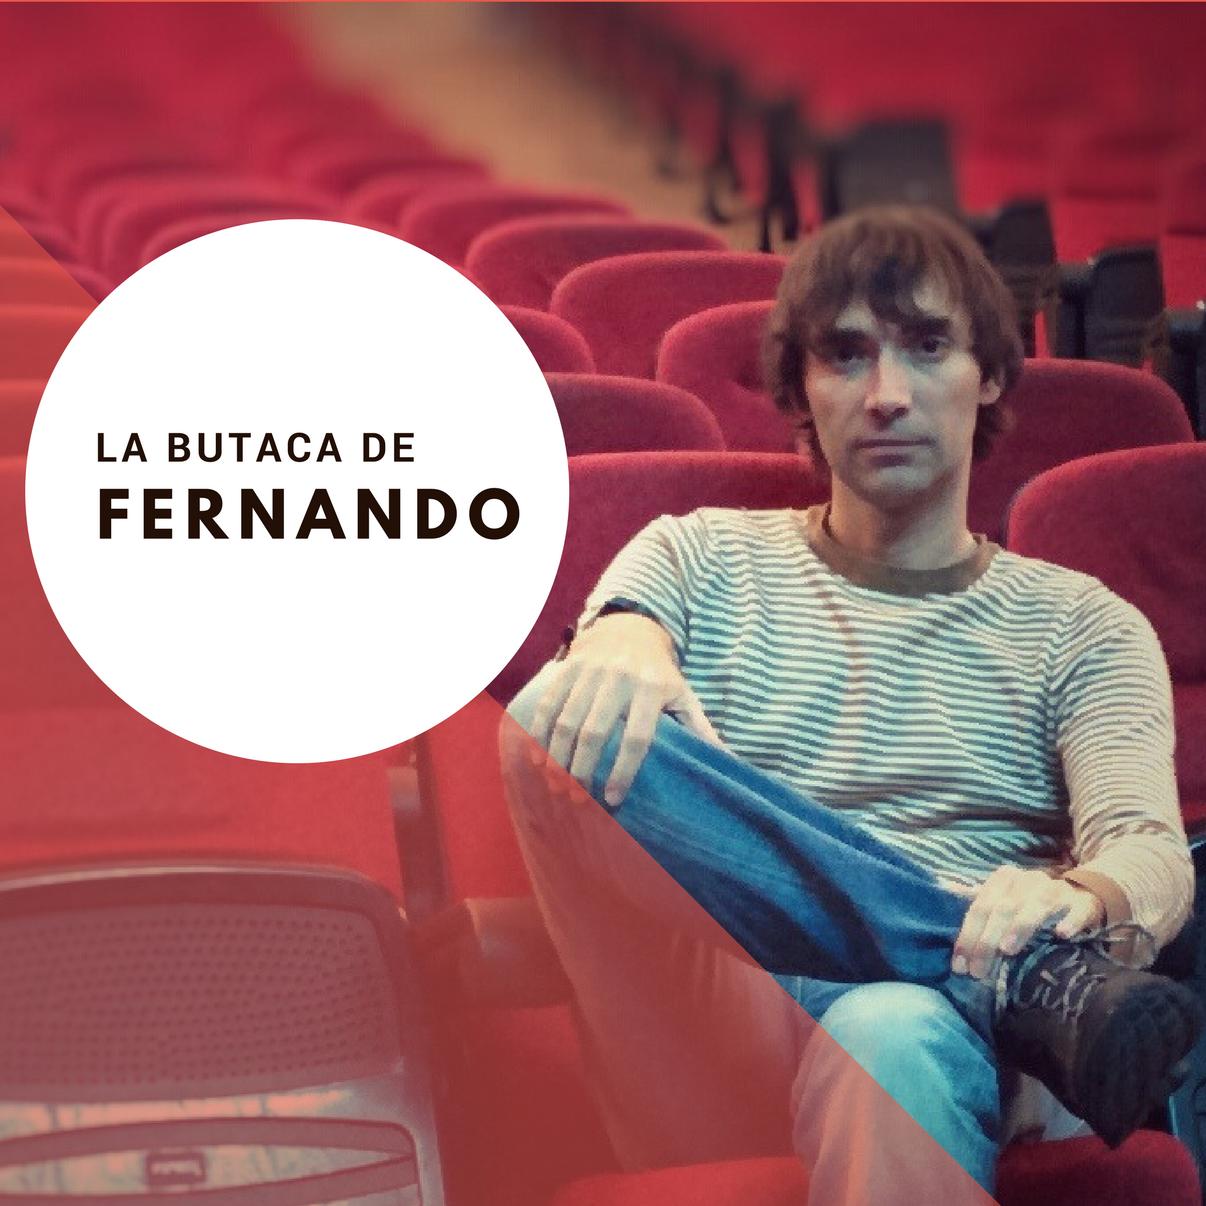 La butaca de Fernando